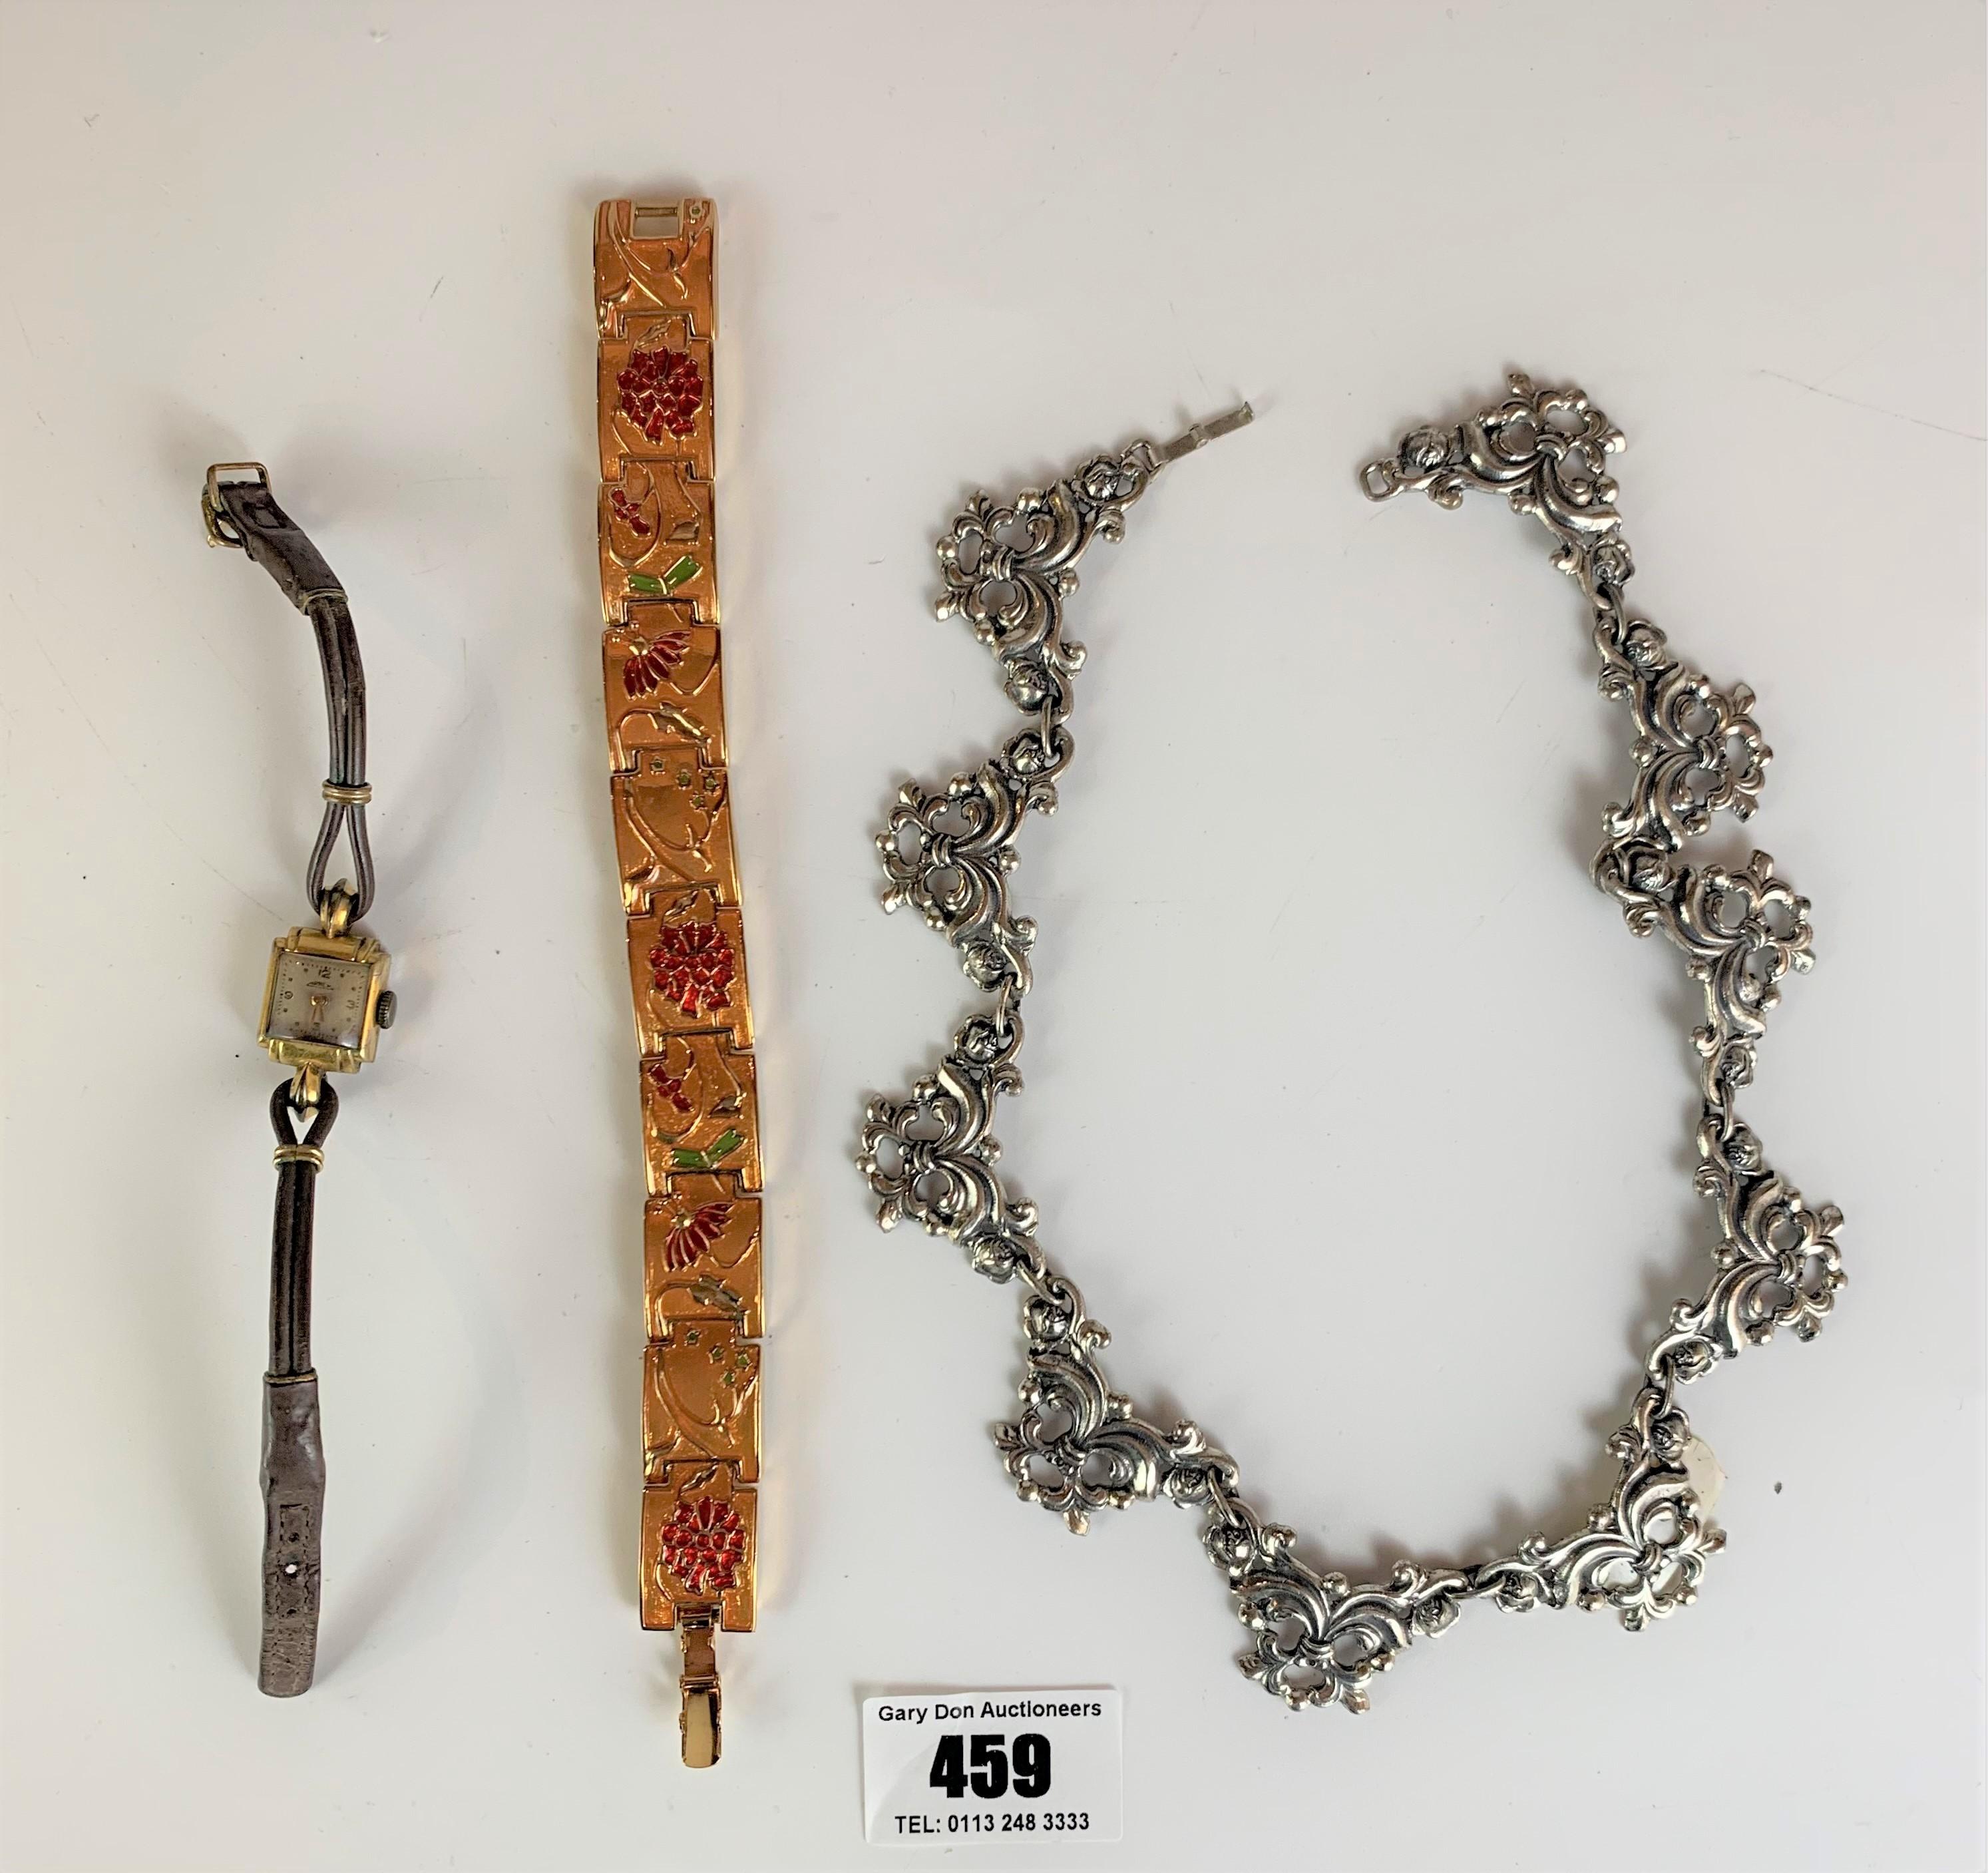 Dress plated necklace, enamel bracelet and Arnex ladies watch